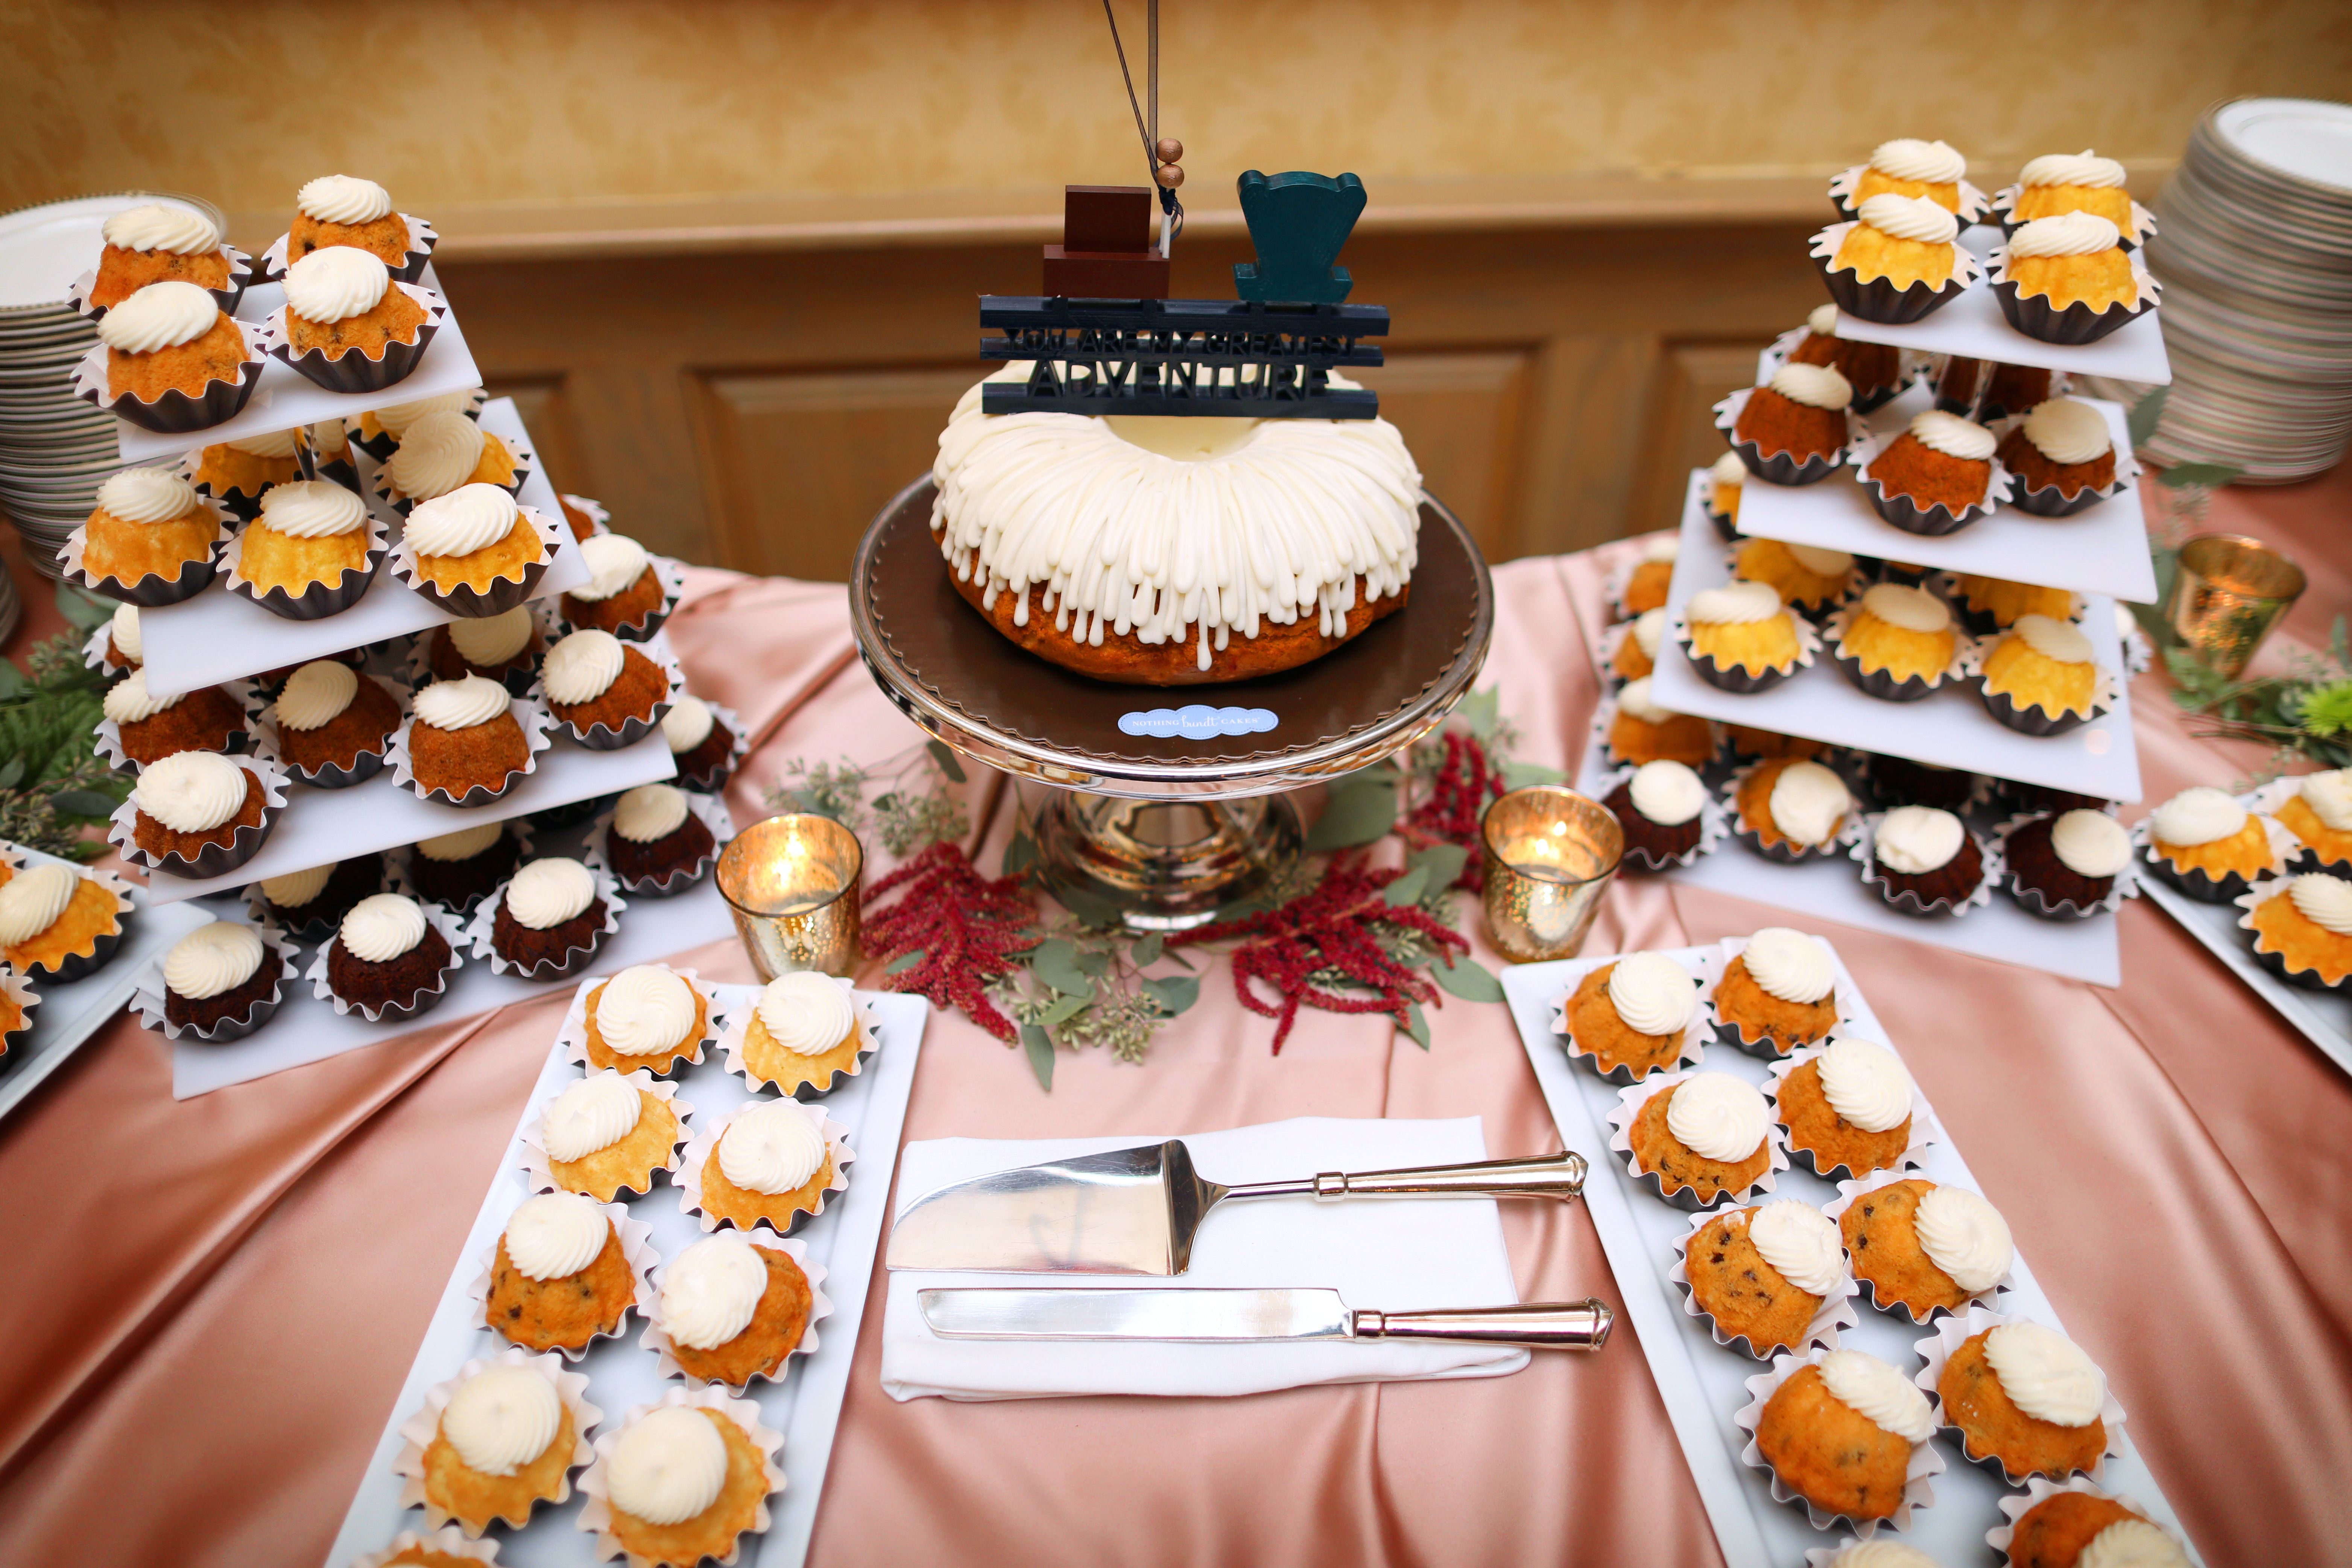 Confession i still look forward to eating wedding cake